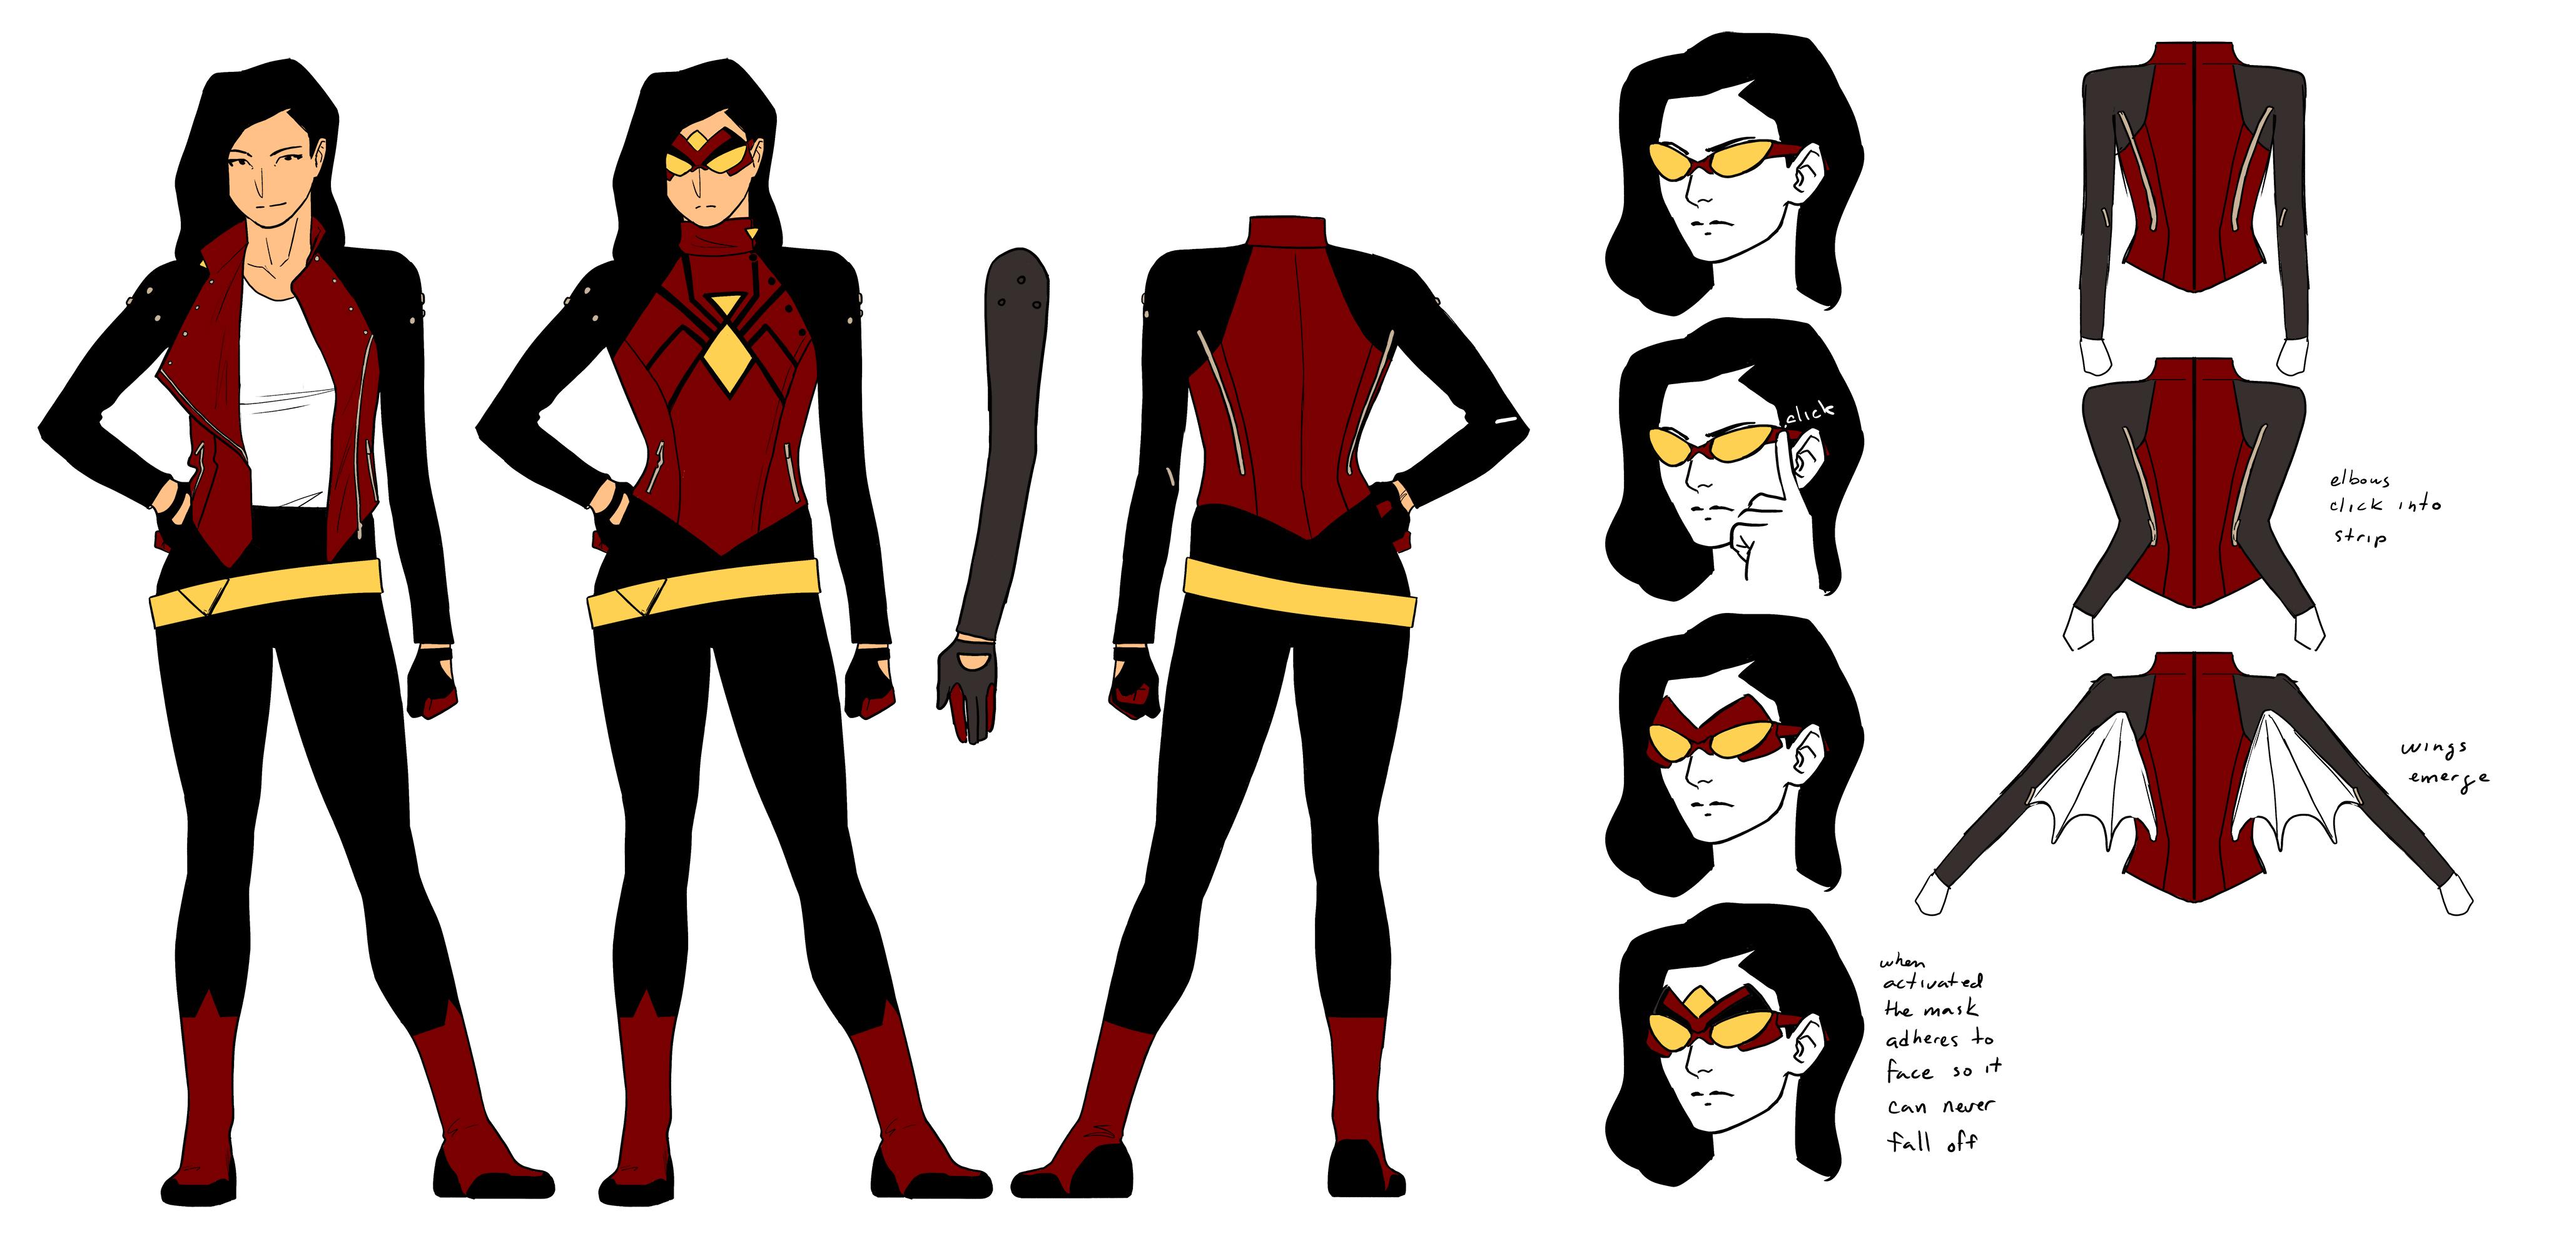 Drawn spider female A New Comic Woman Update